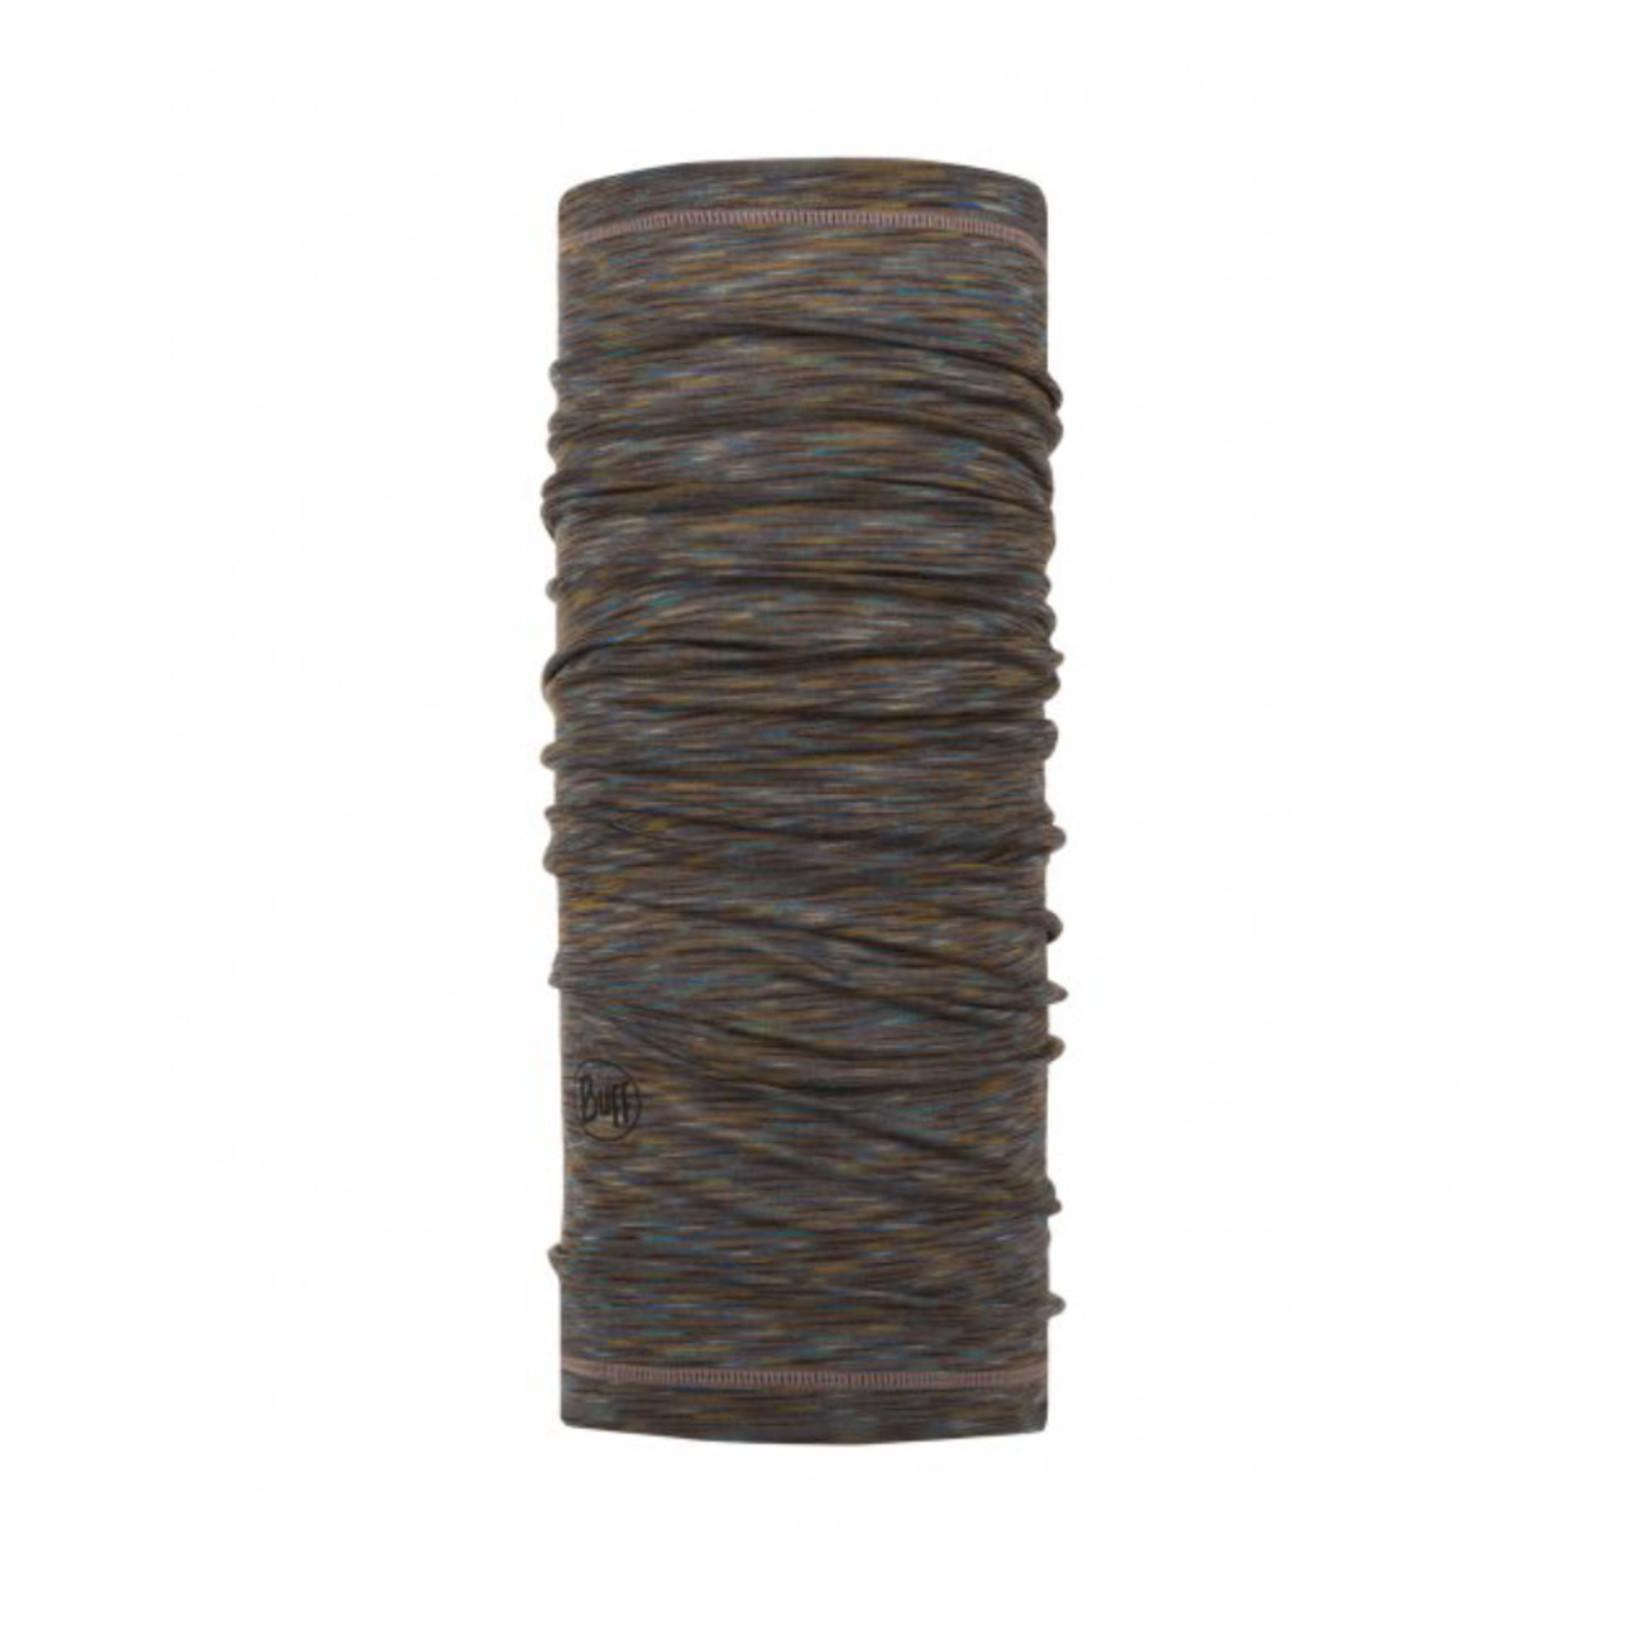 Buff Buff Lightweight Merino Wool Fossil Multi Stripes 117819.311